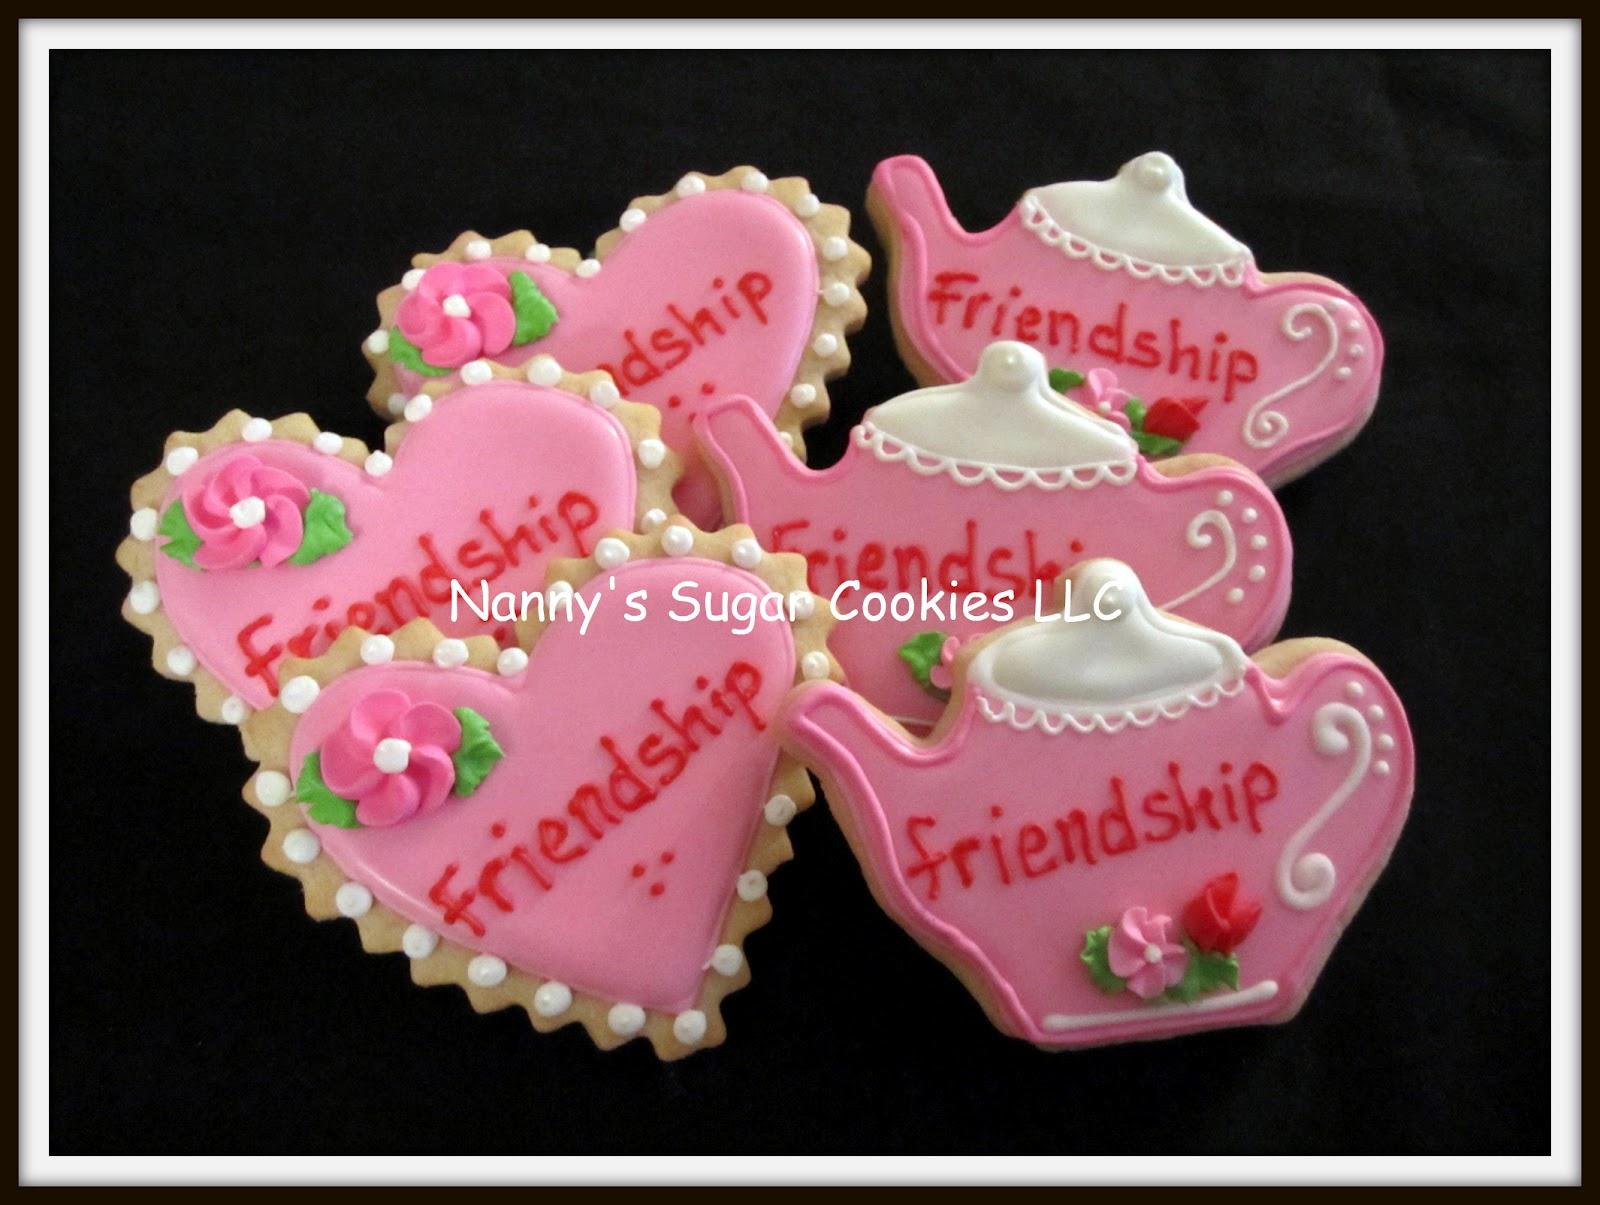 Nanny\'s Sugar Cookies LLC: Friendship Tea Party cookie favors...